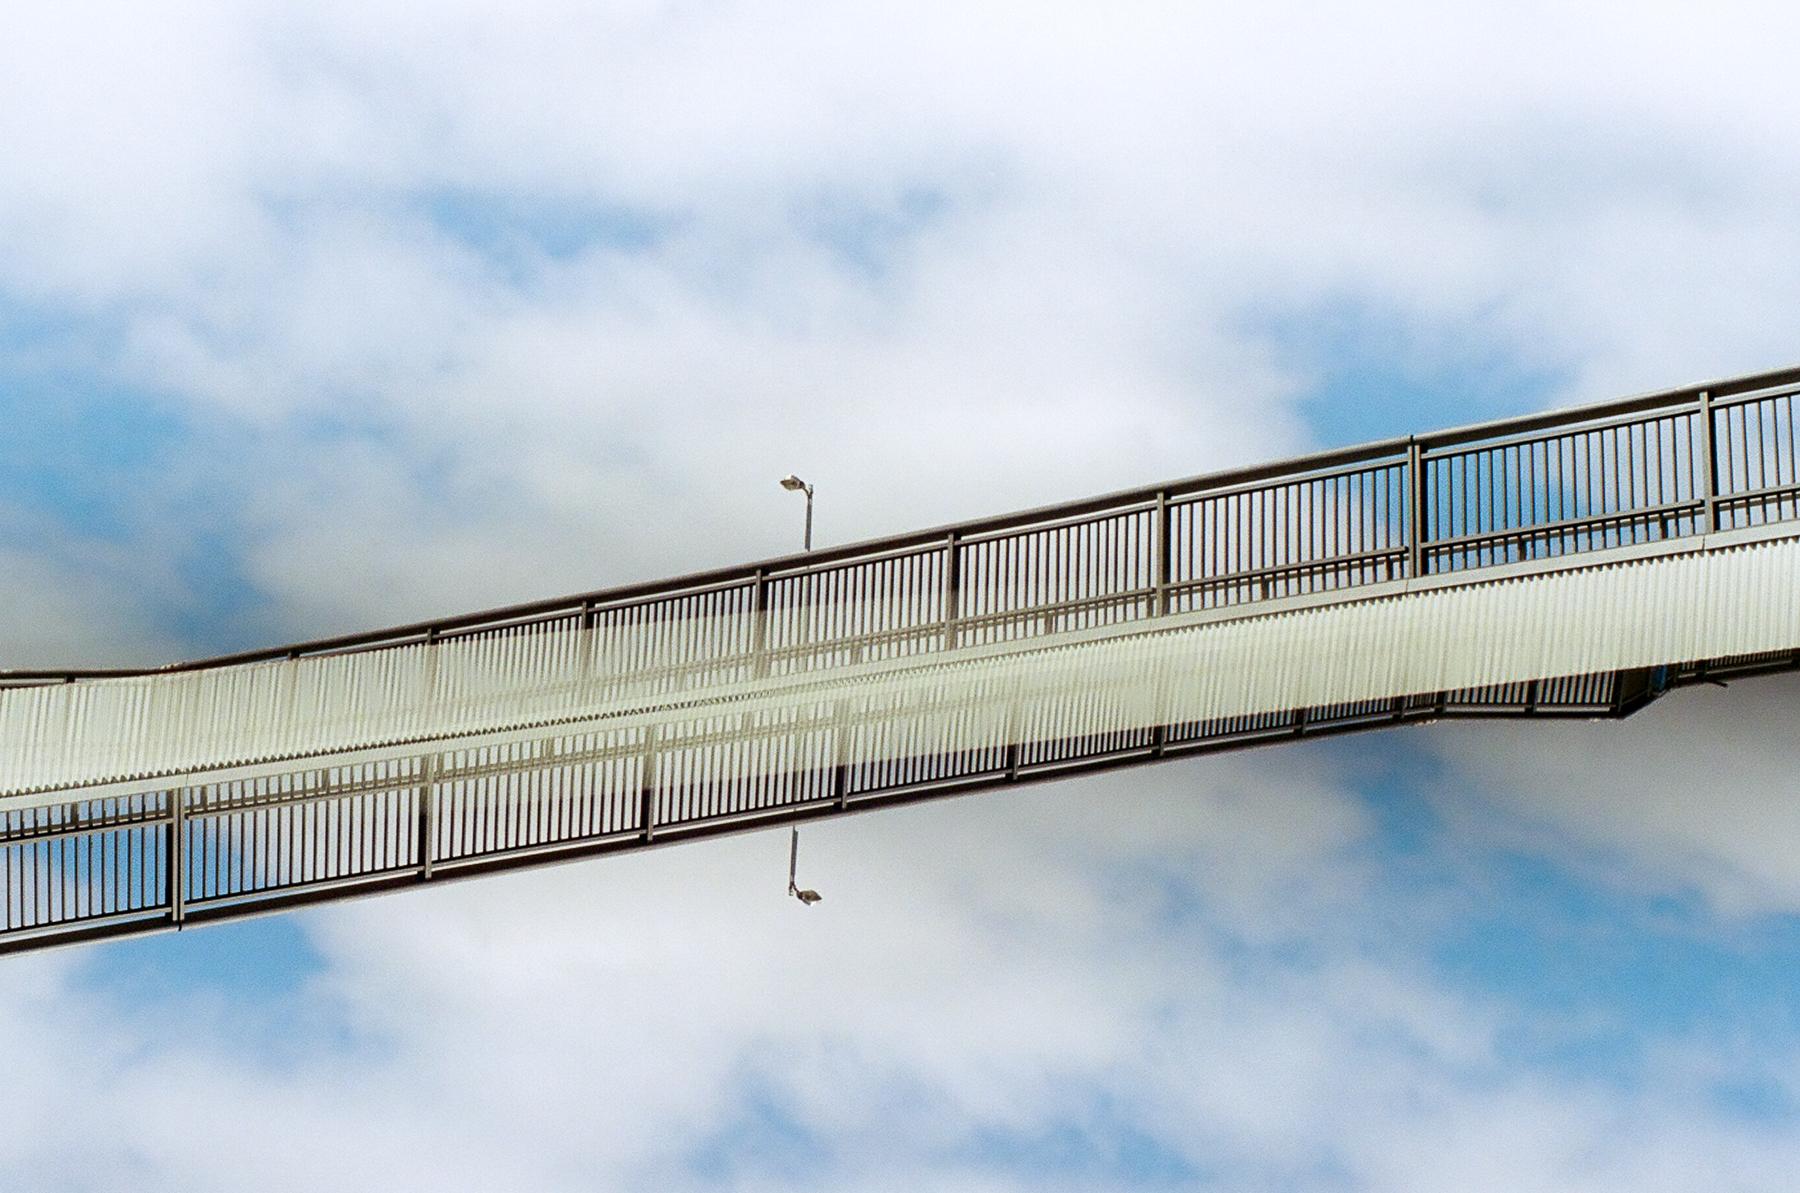 Skybridge | Chinon Memotron II | Double Exposure | Kodak Gold 400 | Jane McLoughlin